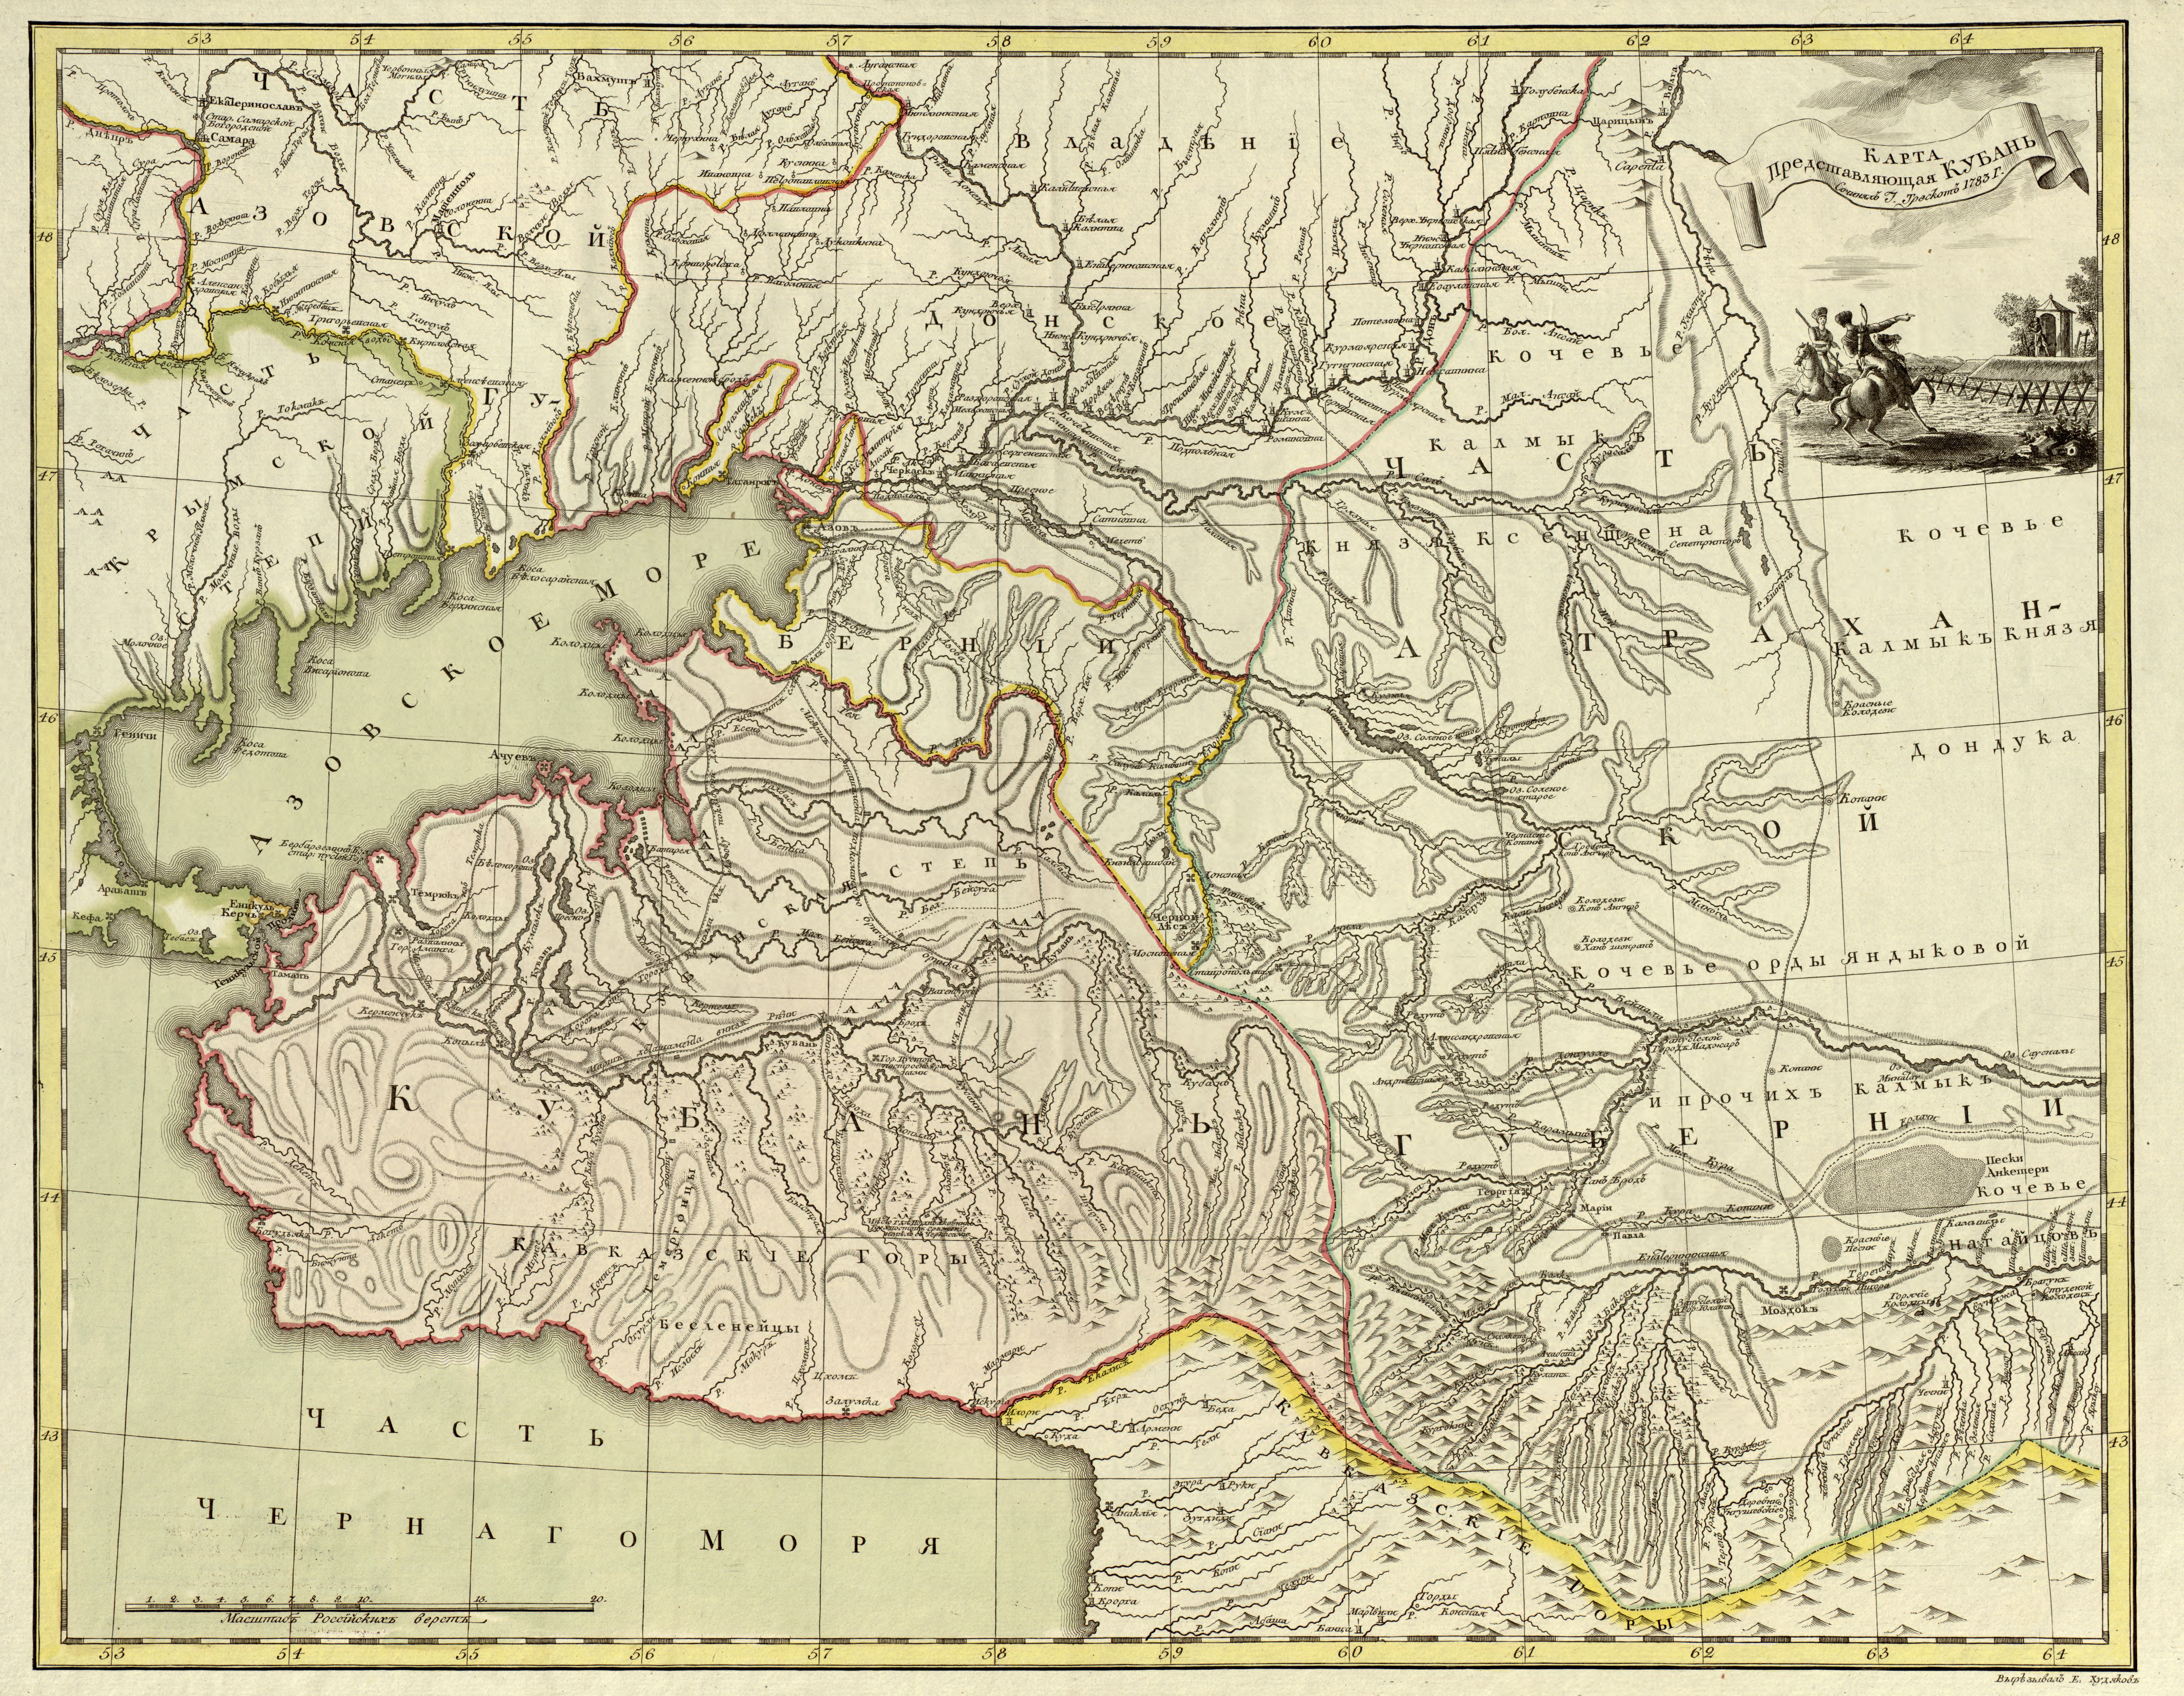 http://kubangenealogy.ucoz.ru/Kuban_1783_Treskot.jpg